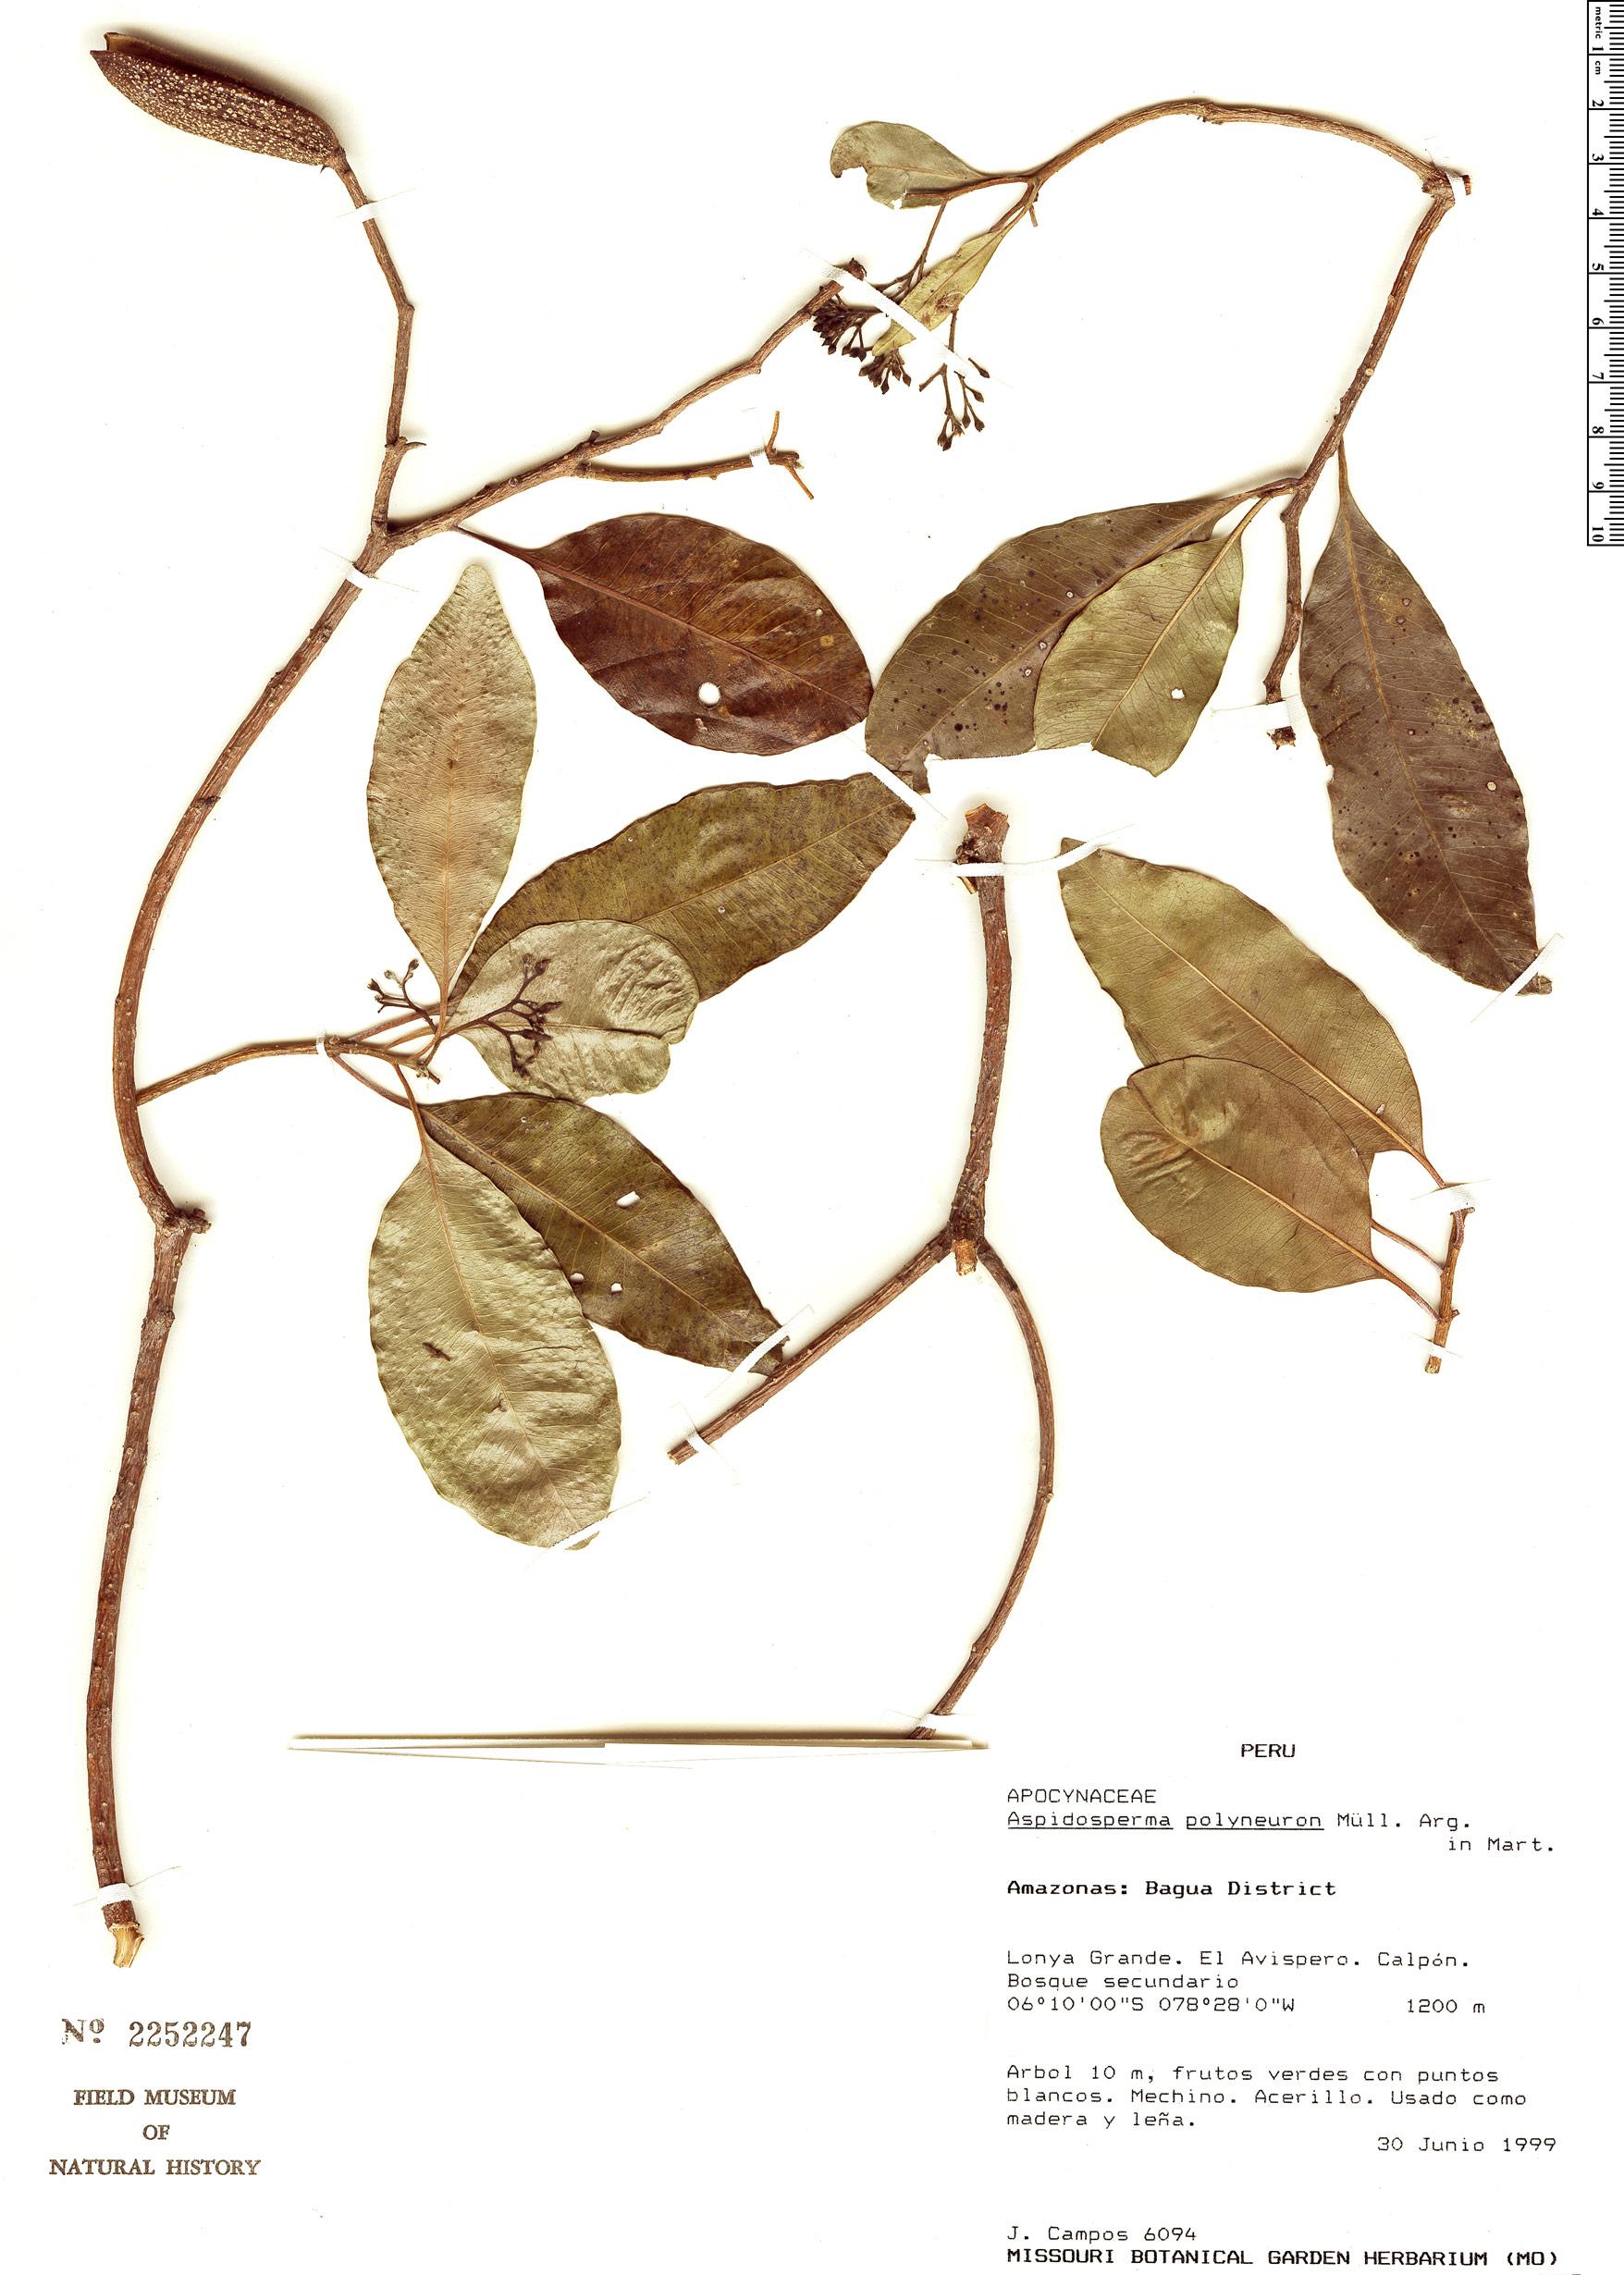 Espécimen: Aspidosperma polyneuron